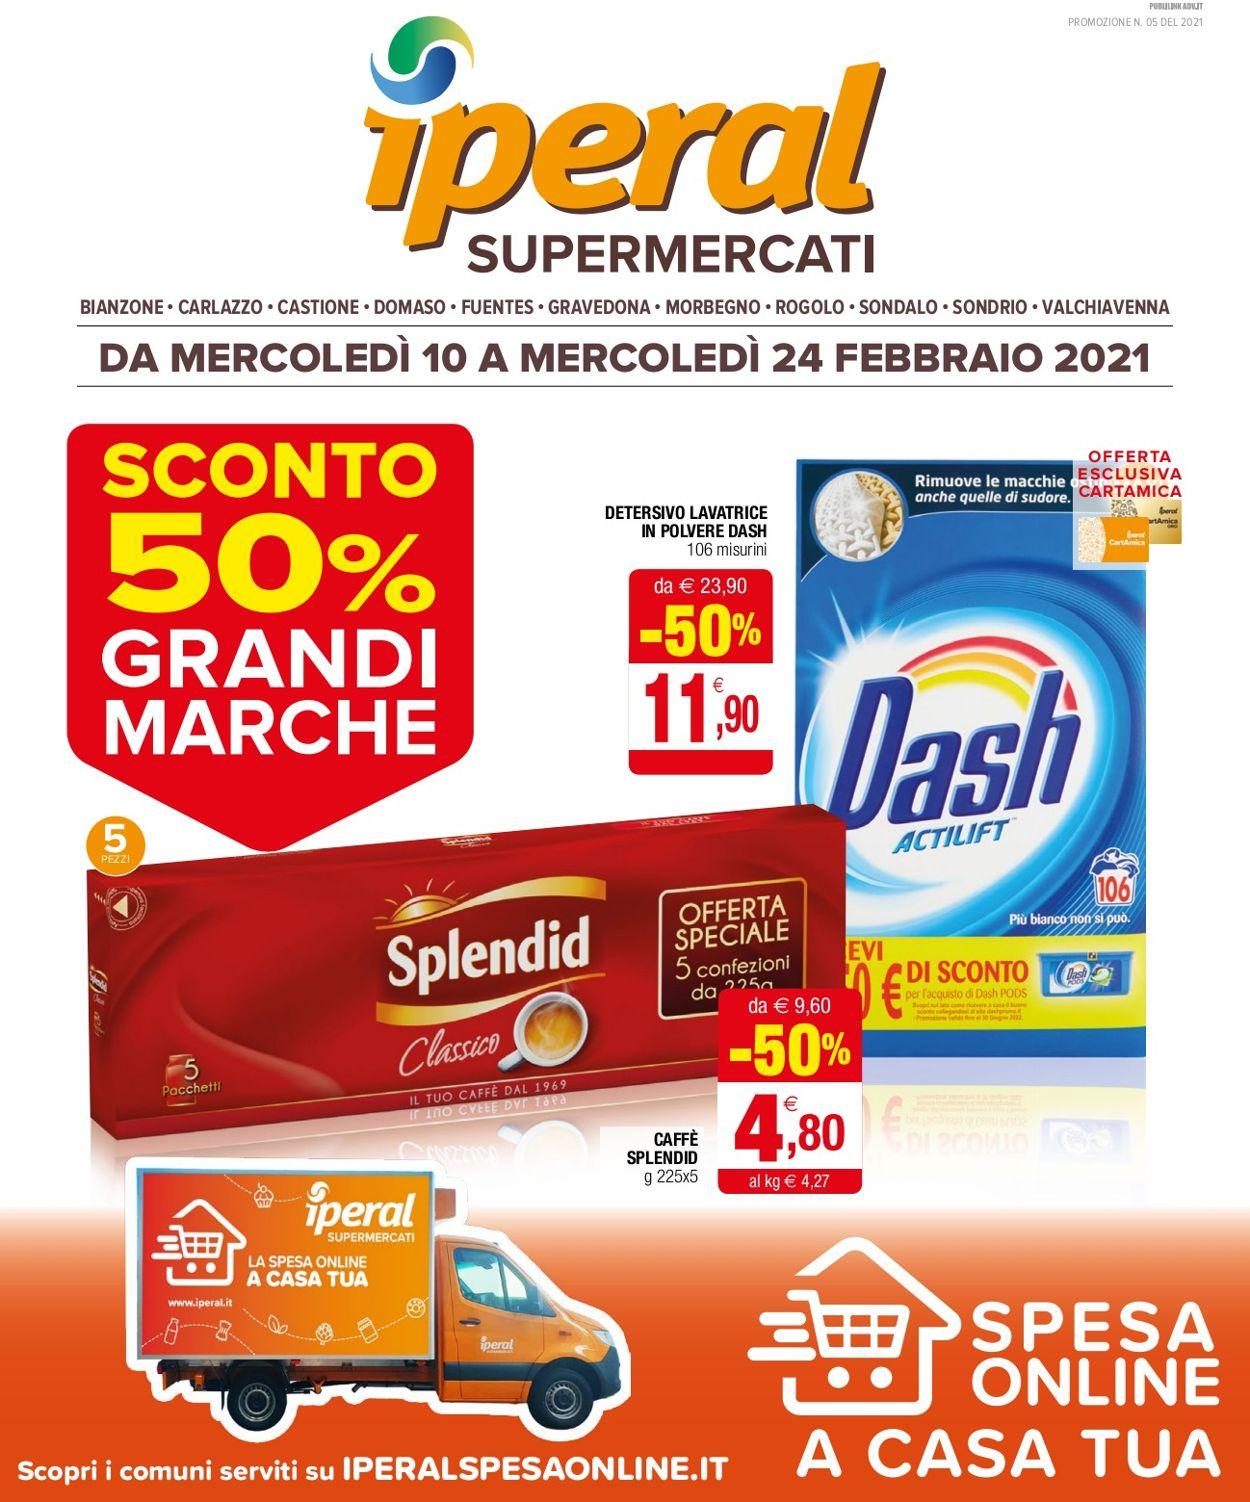 Volantino Iperal Supermercati - Offerte 10/02-24/02/2021